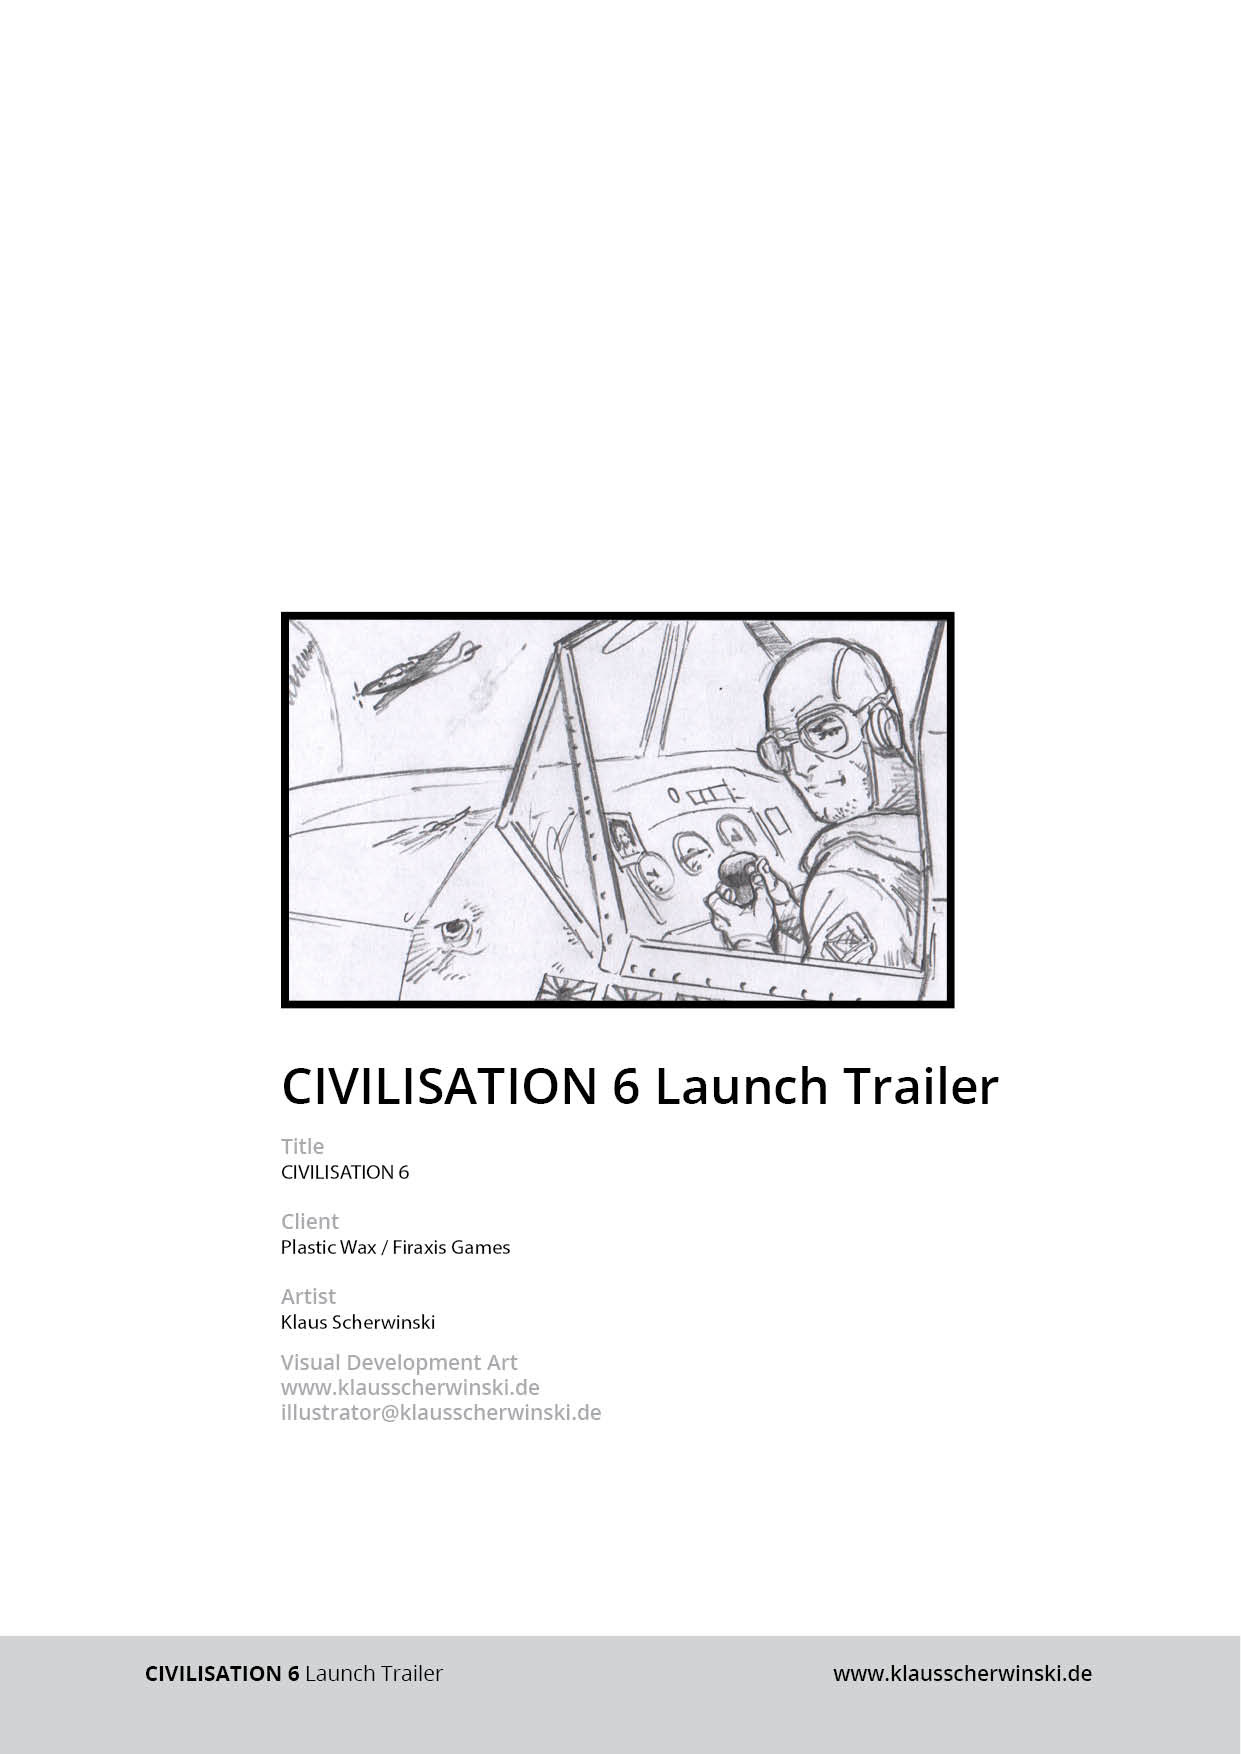 Klaus scherwinski sv civilisation6 storyboards